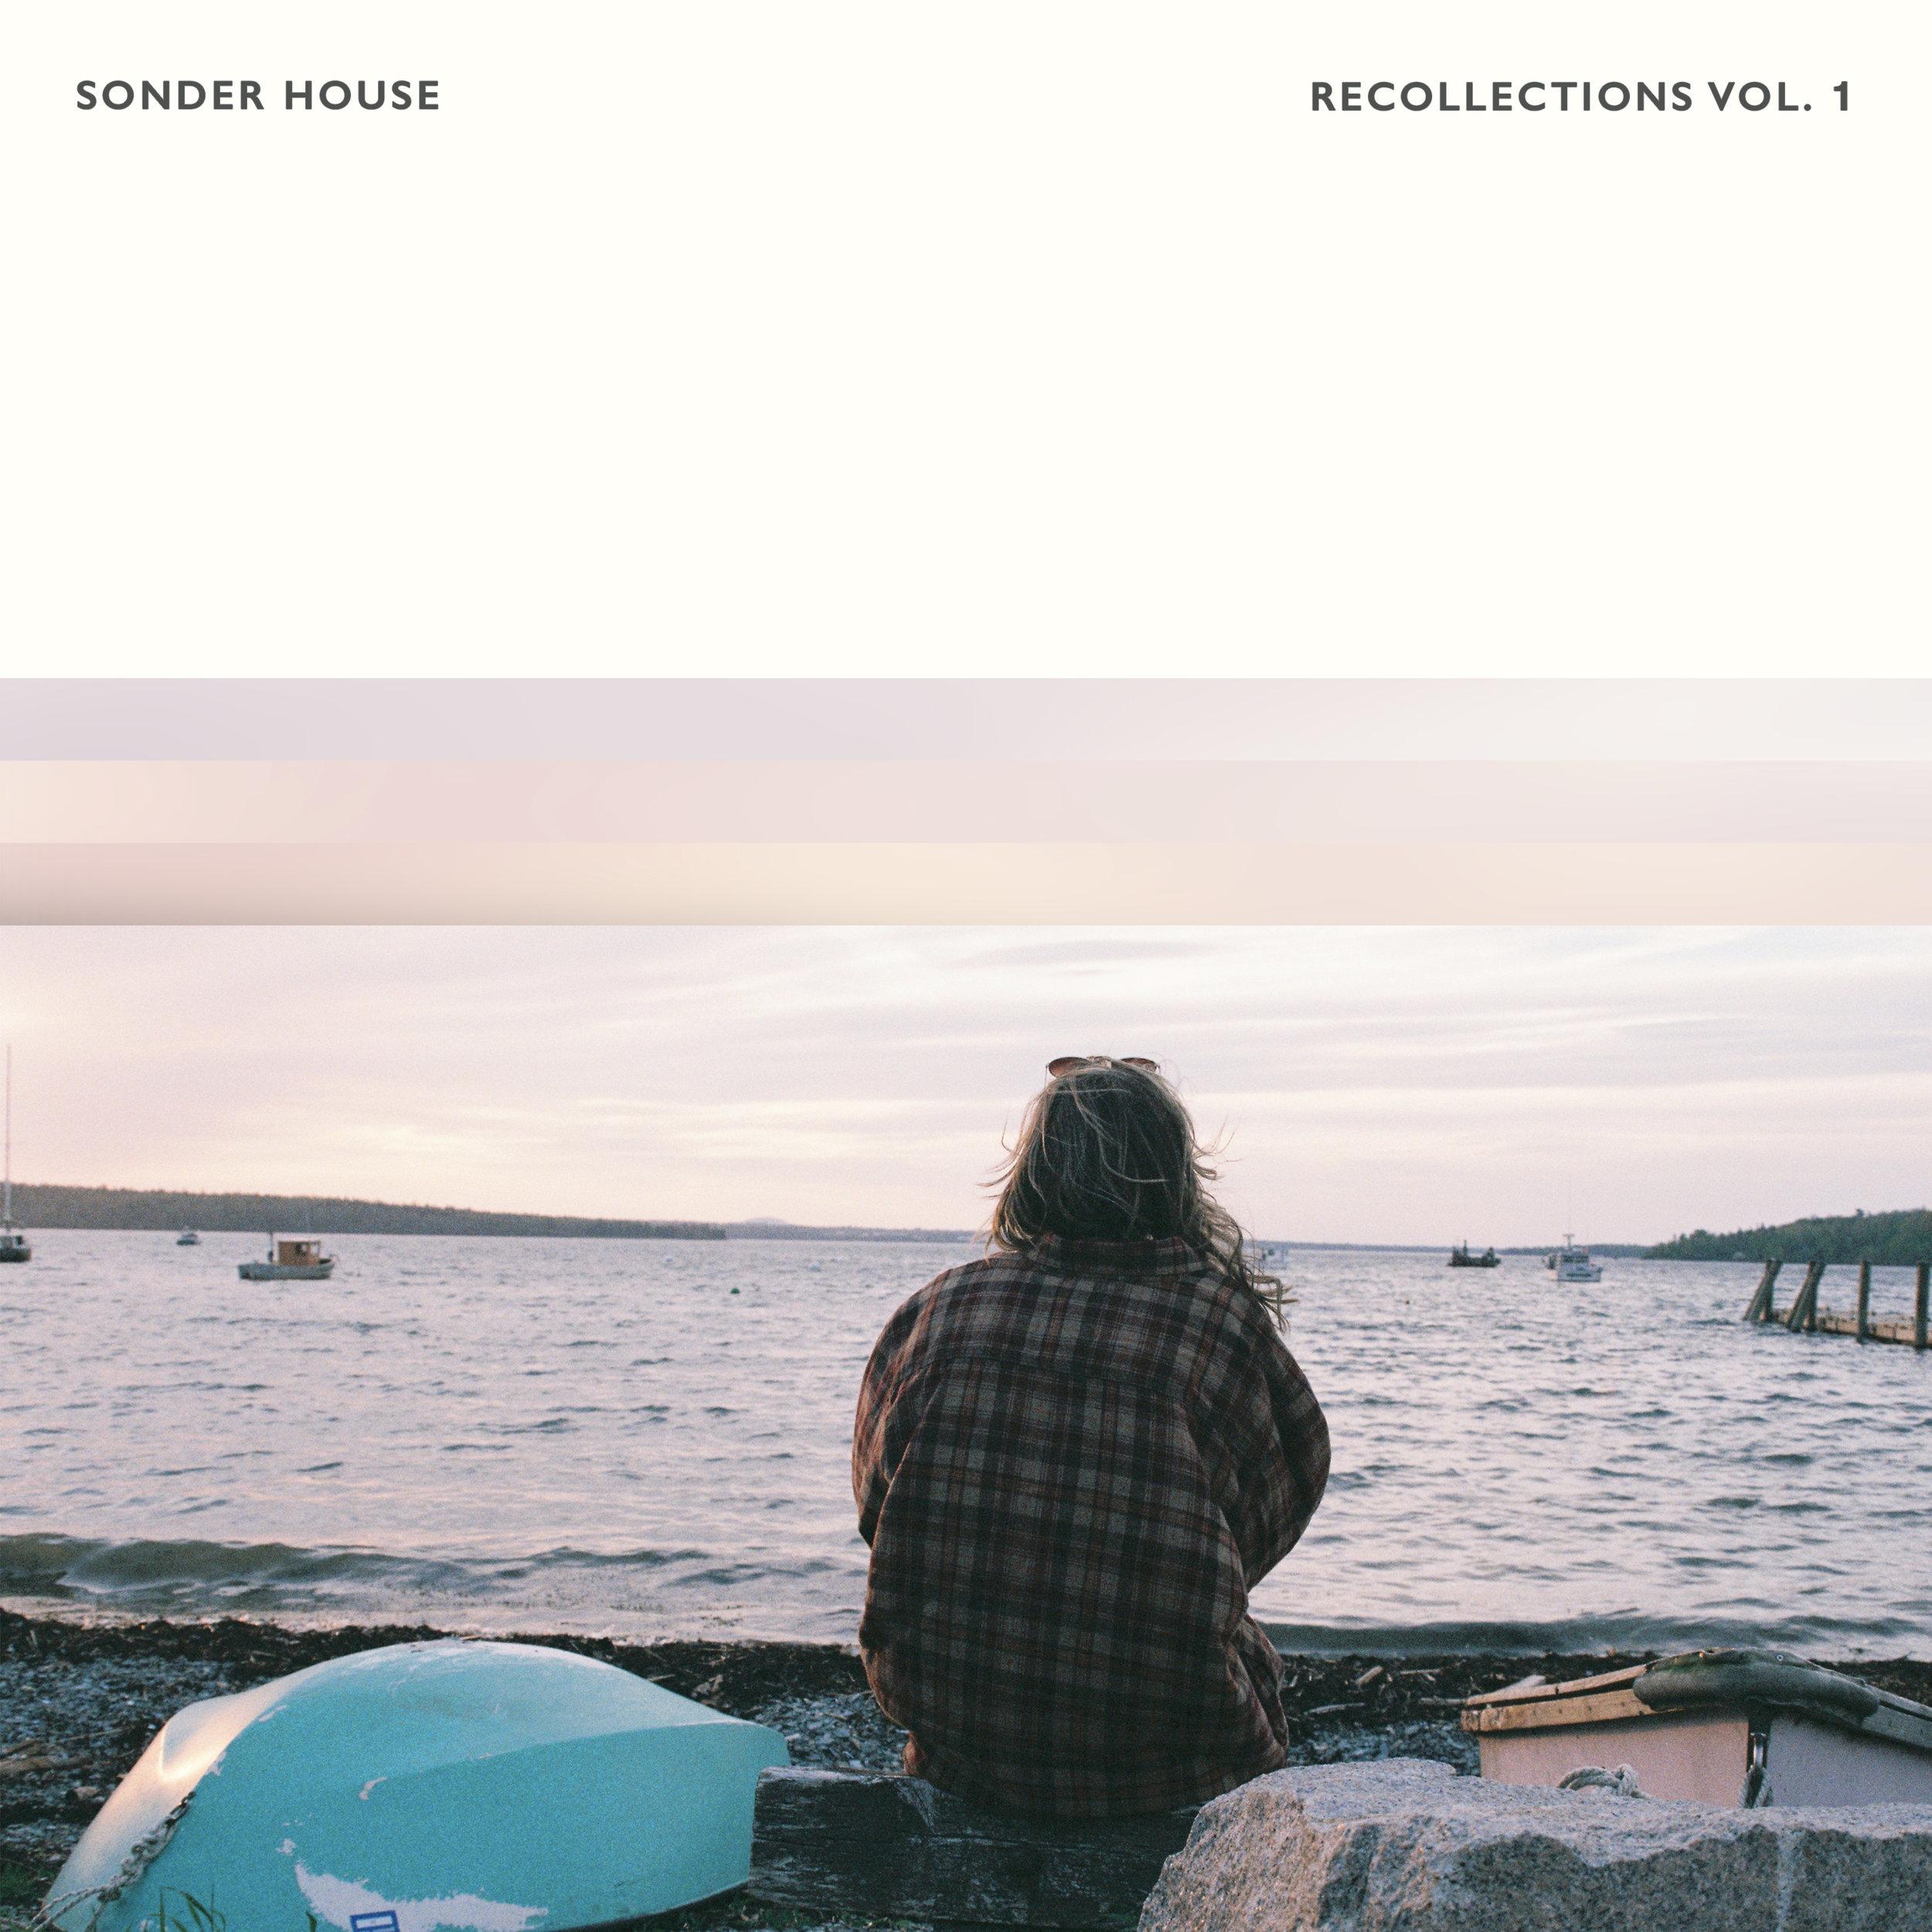 Sonder House - Recollections Vol. 1 Album Artwork.jpg